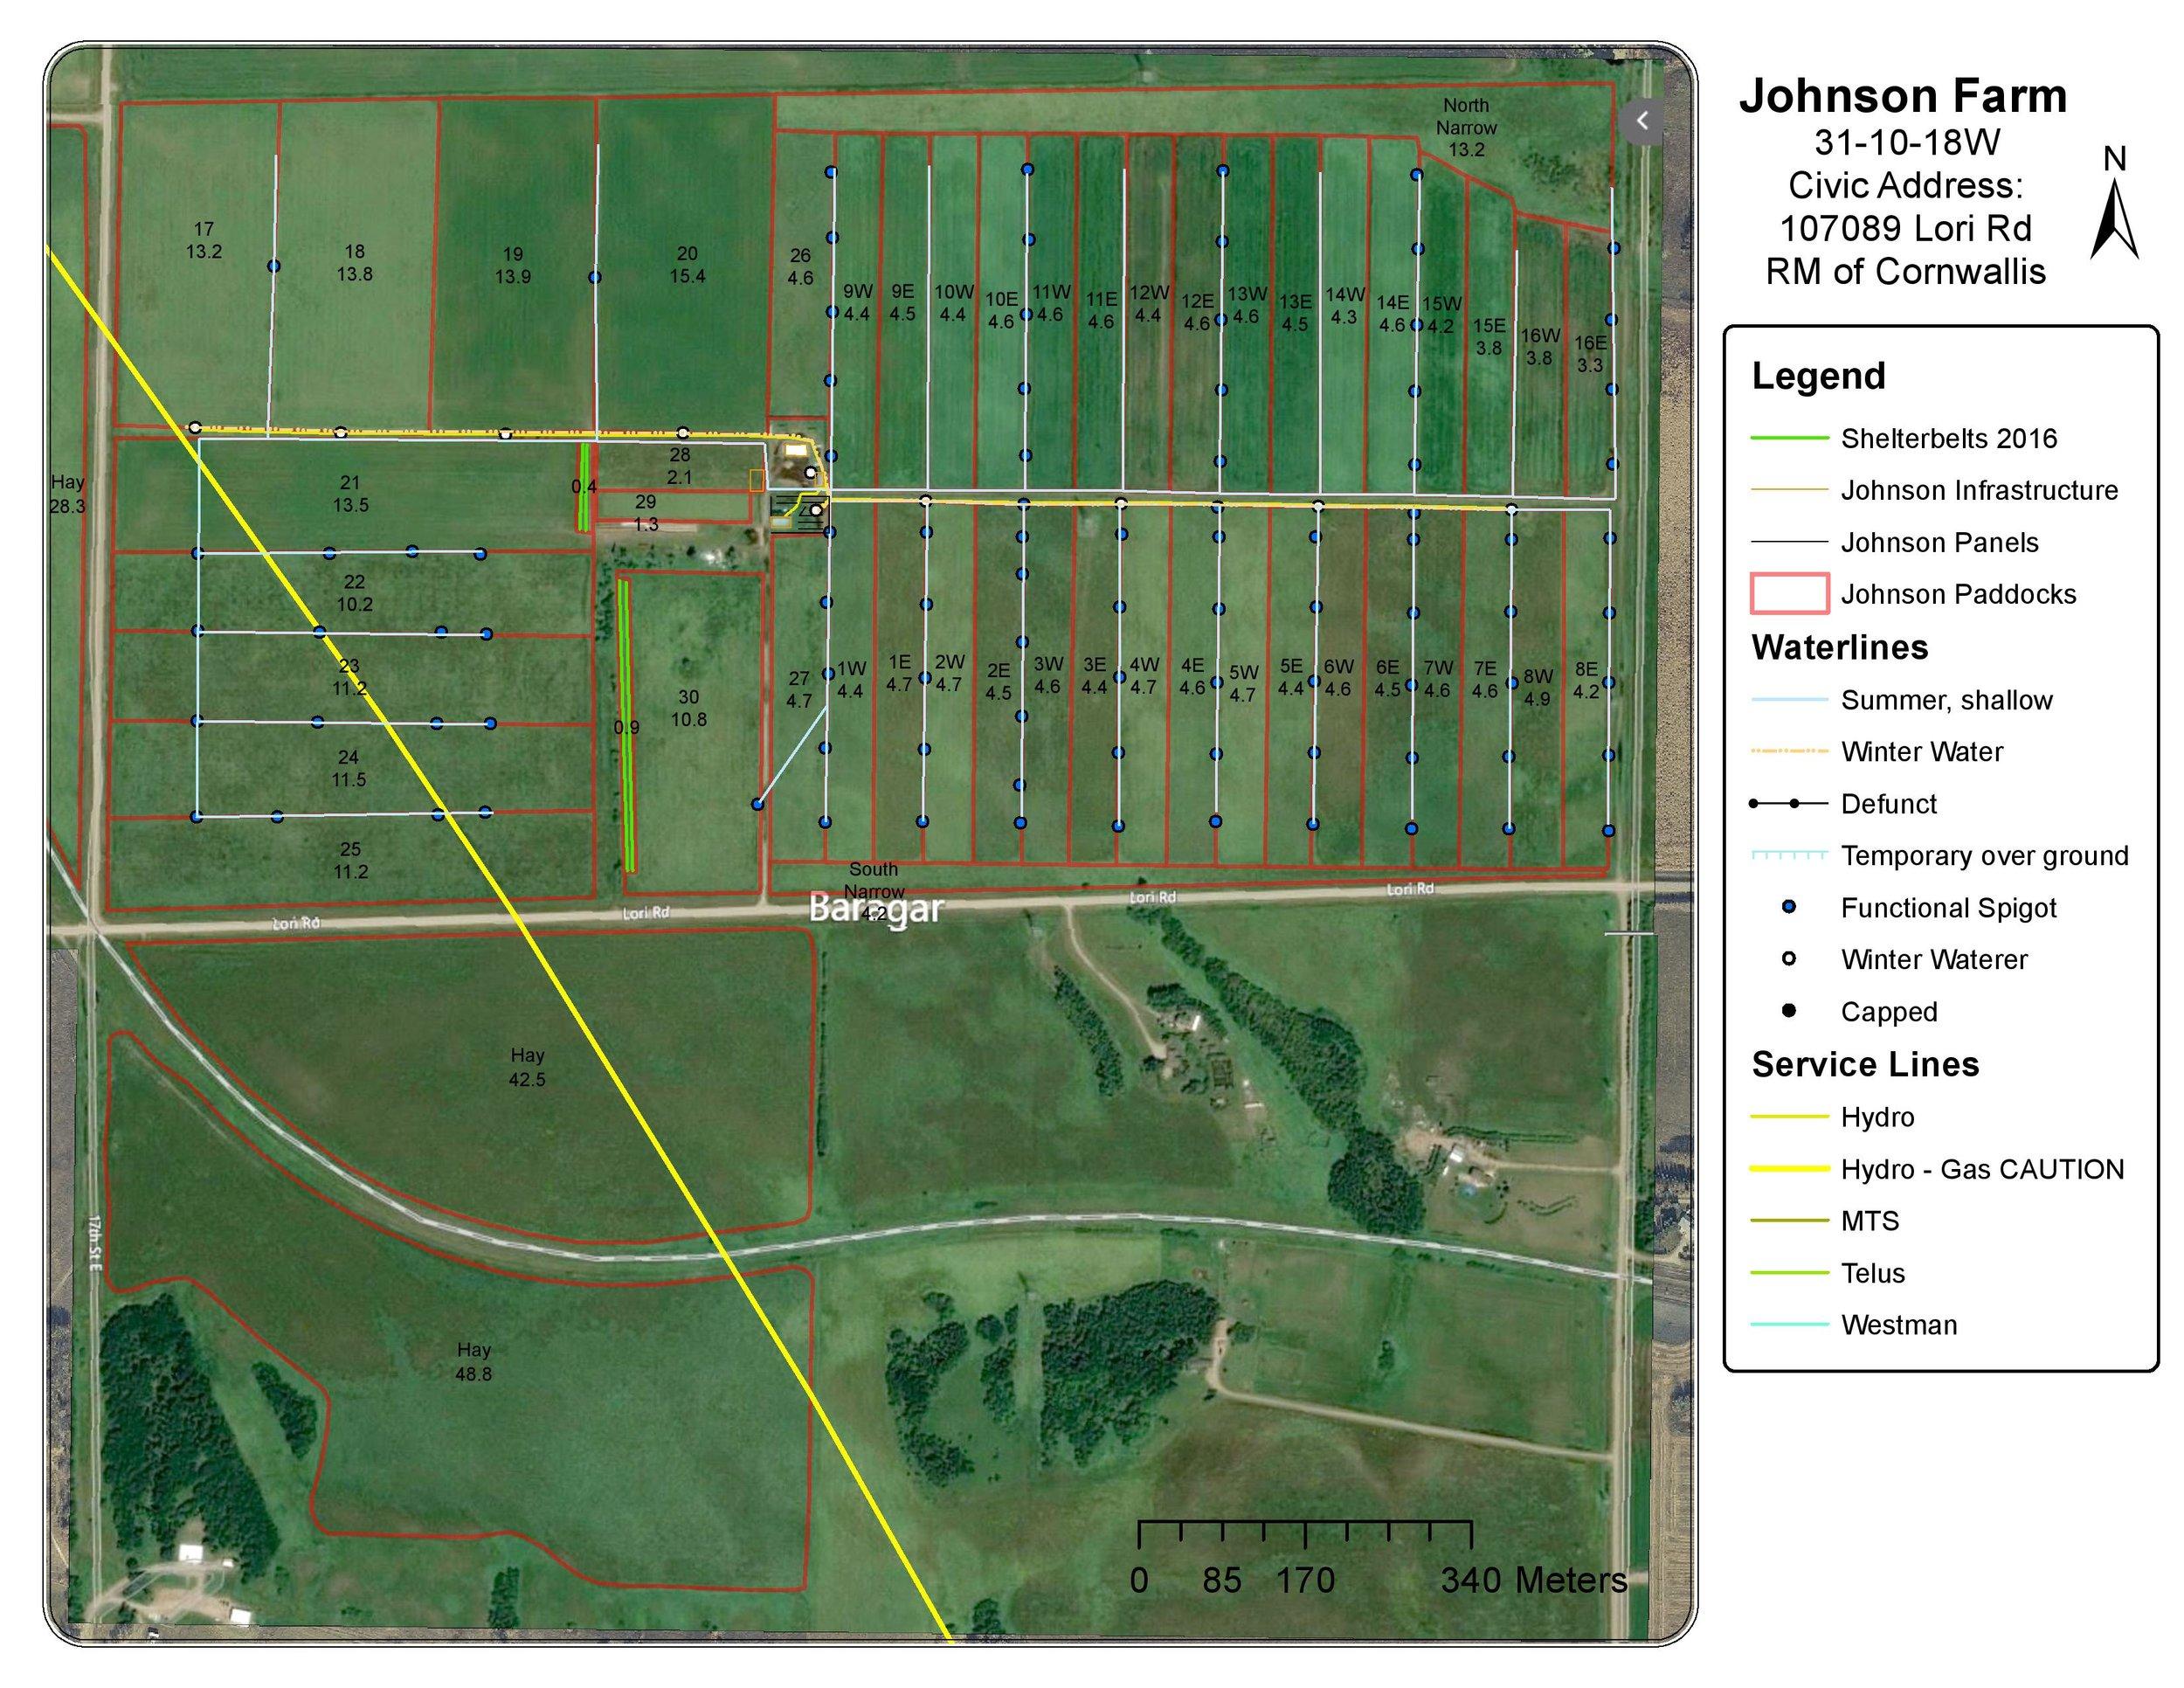 Johnson Farm Map